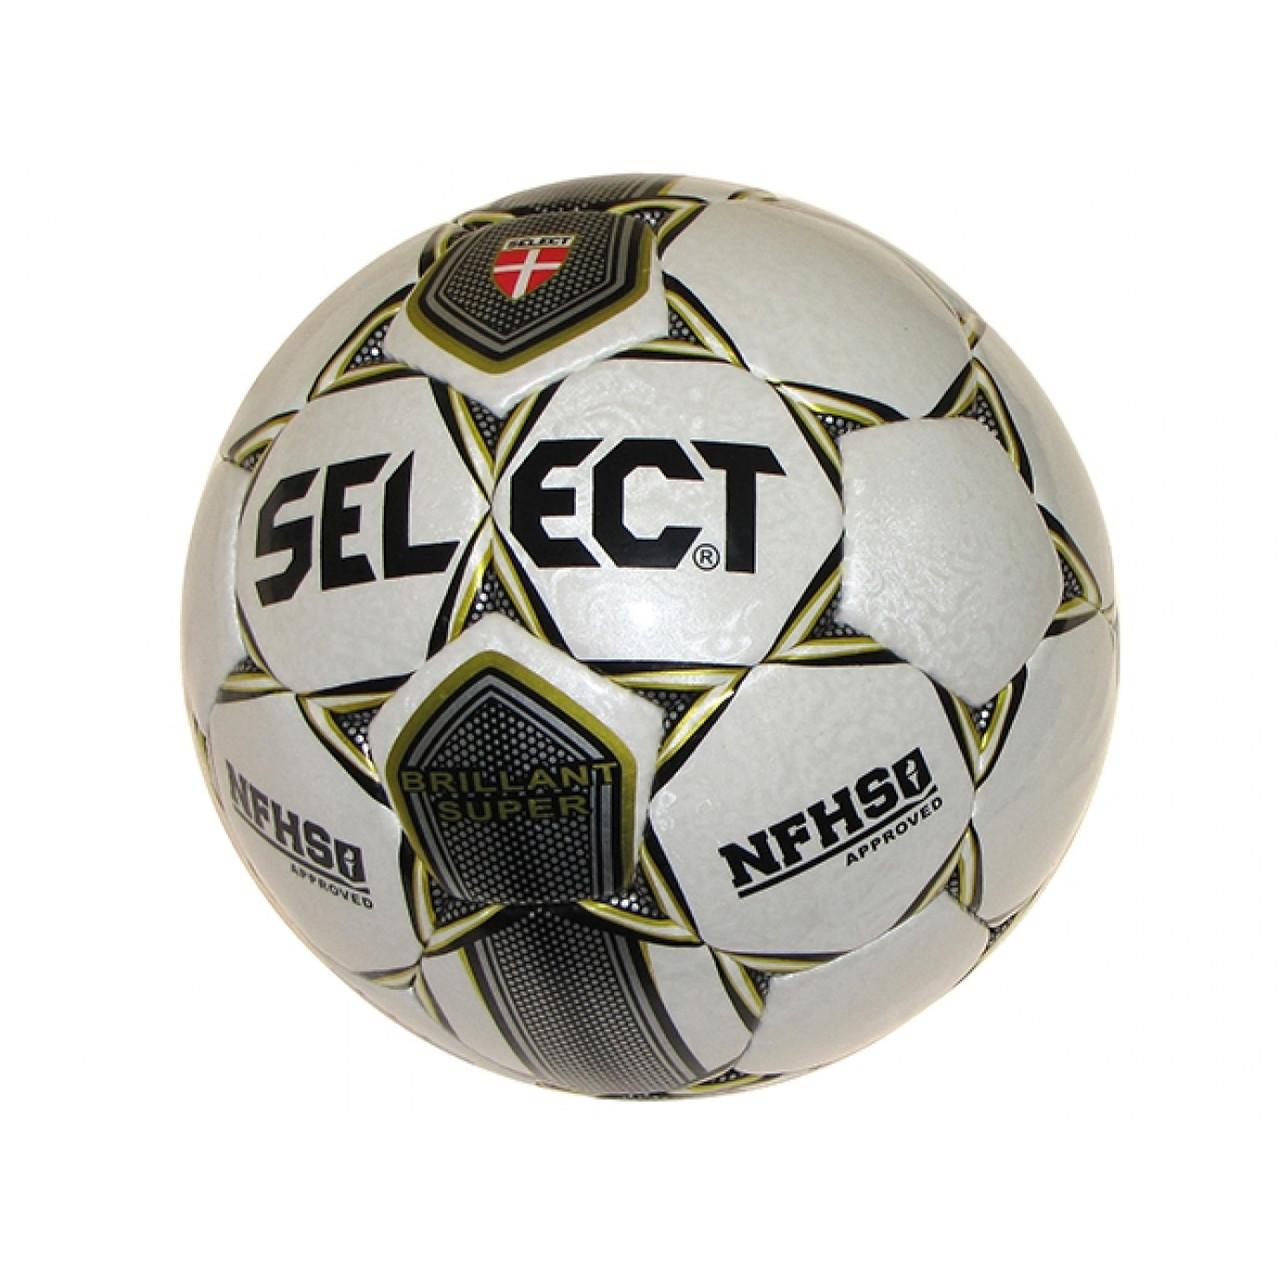 М'яч футбольний Select Briliant Super